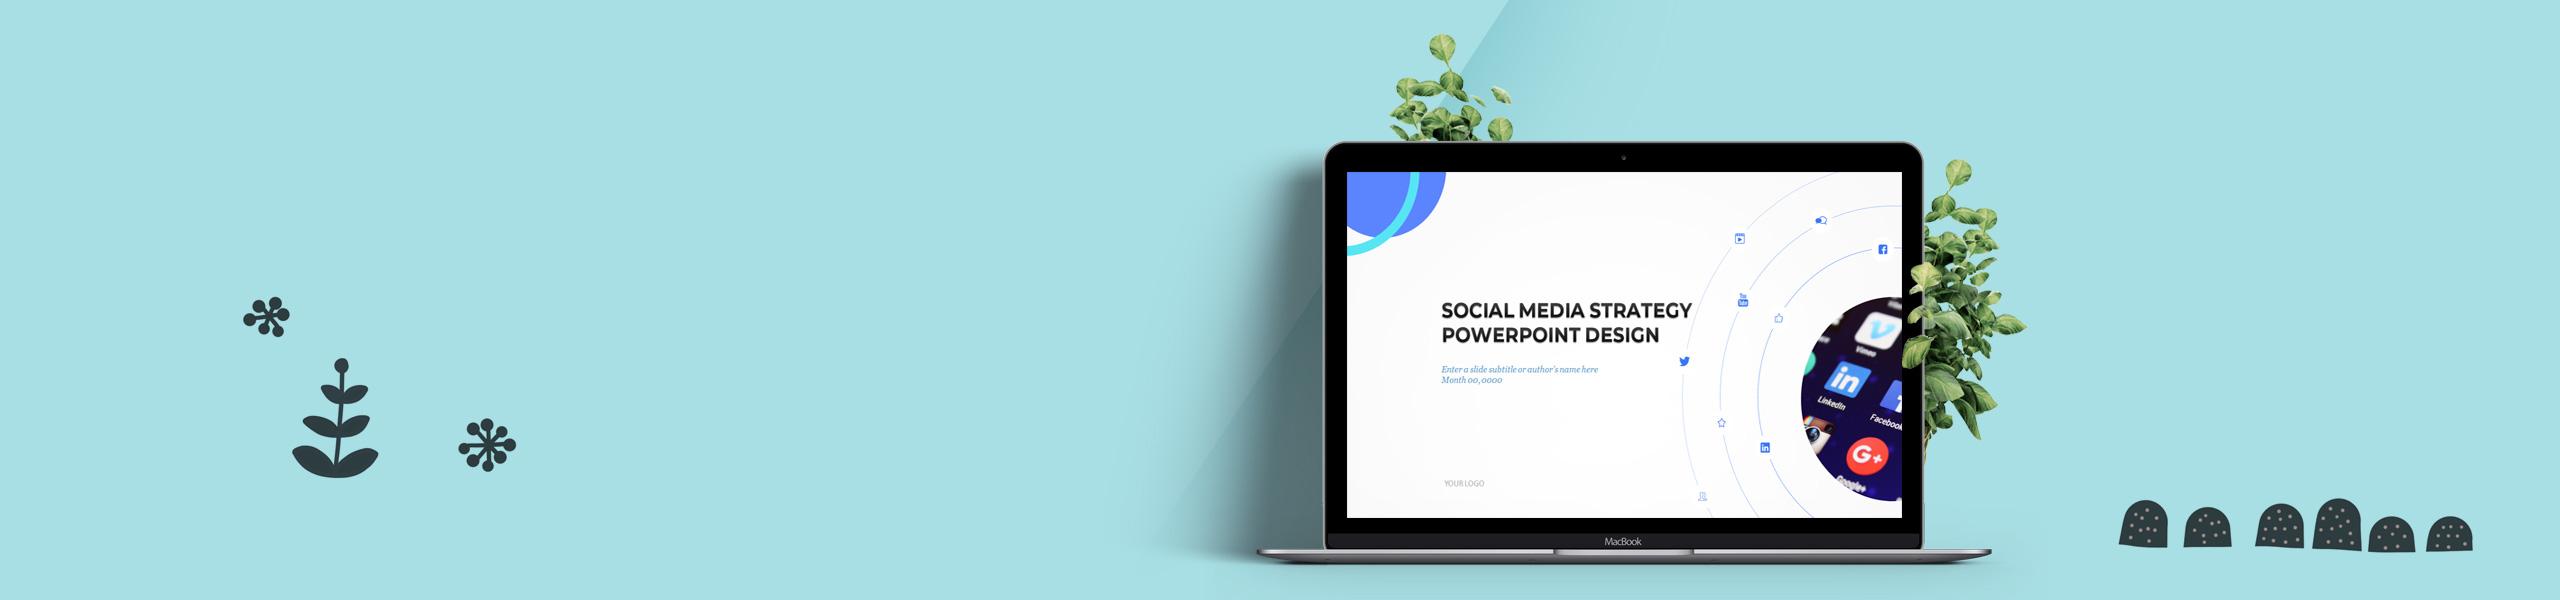 display_Social-Media-Strategy